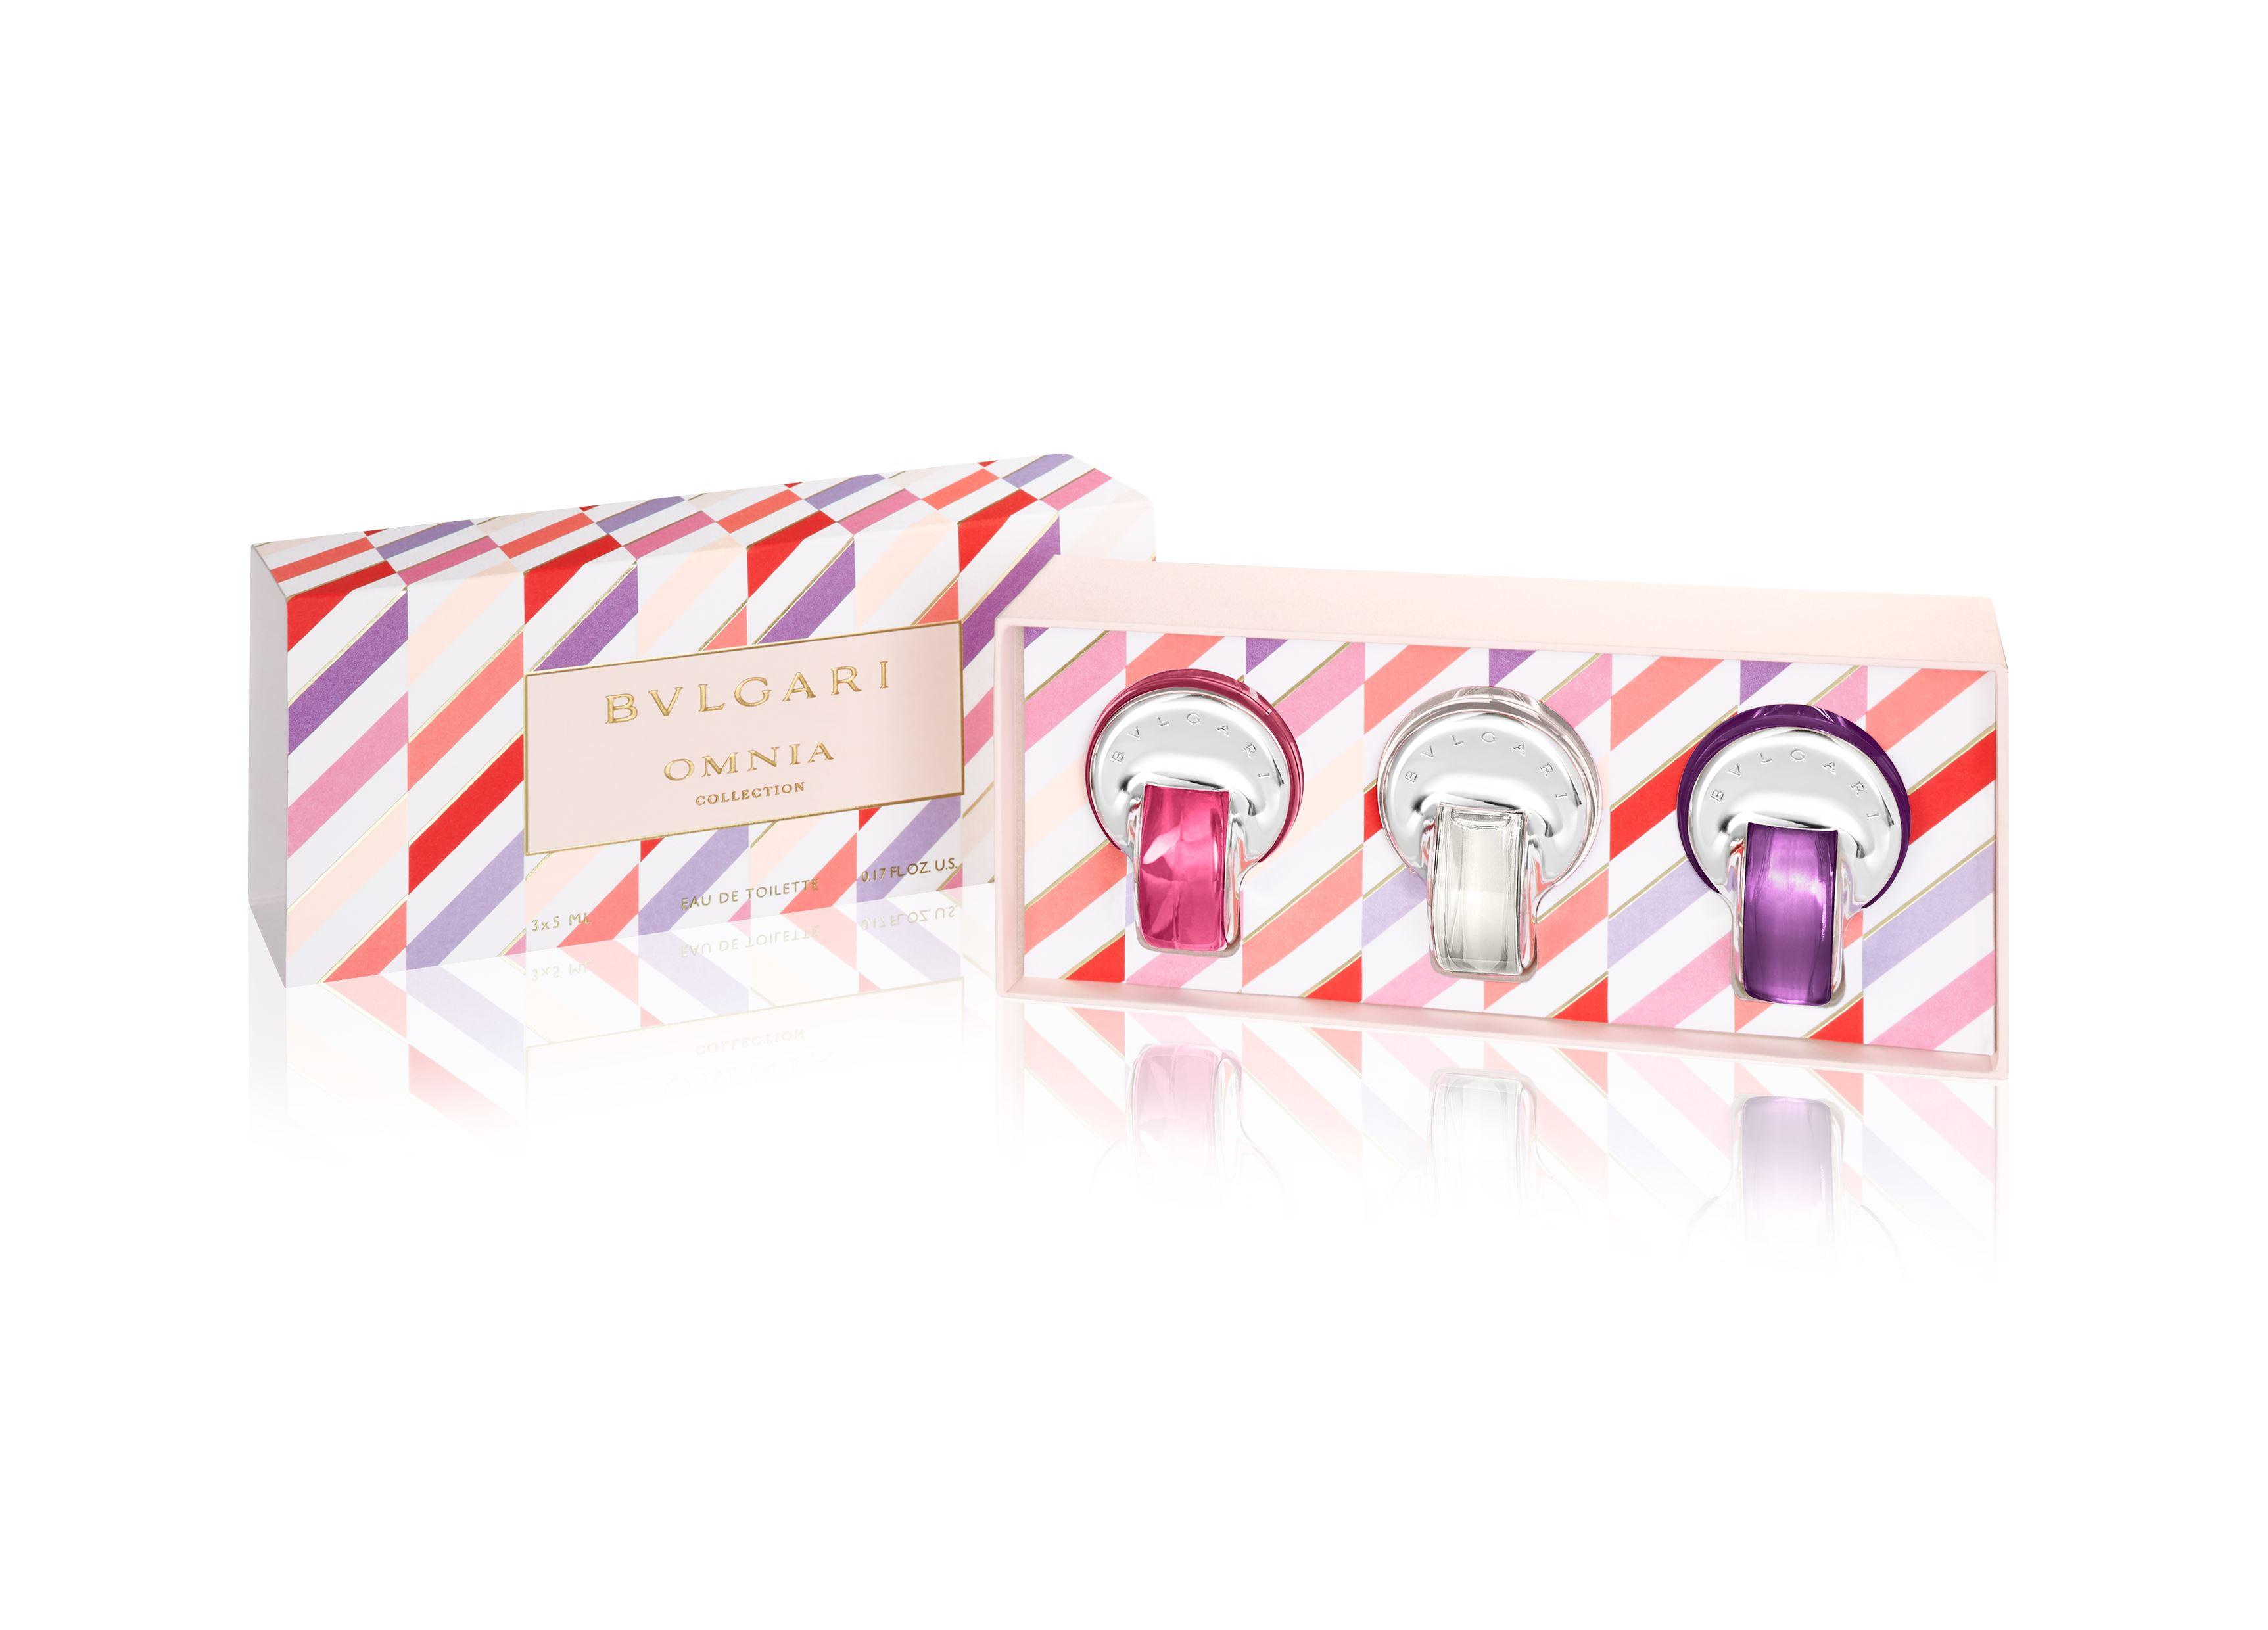 Bvlgari | Omnia Collection Eau de Toilette Kit (Omnia Crystalline and Omnia Pink Sapphire and Omnia Amethyste) 5 MLx3